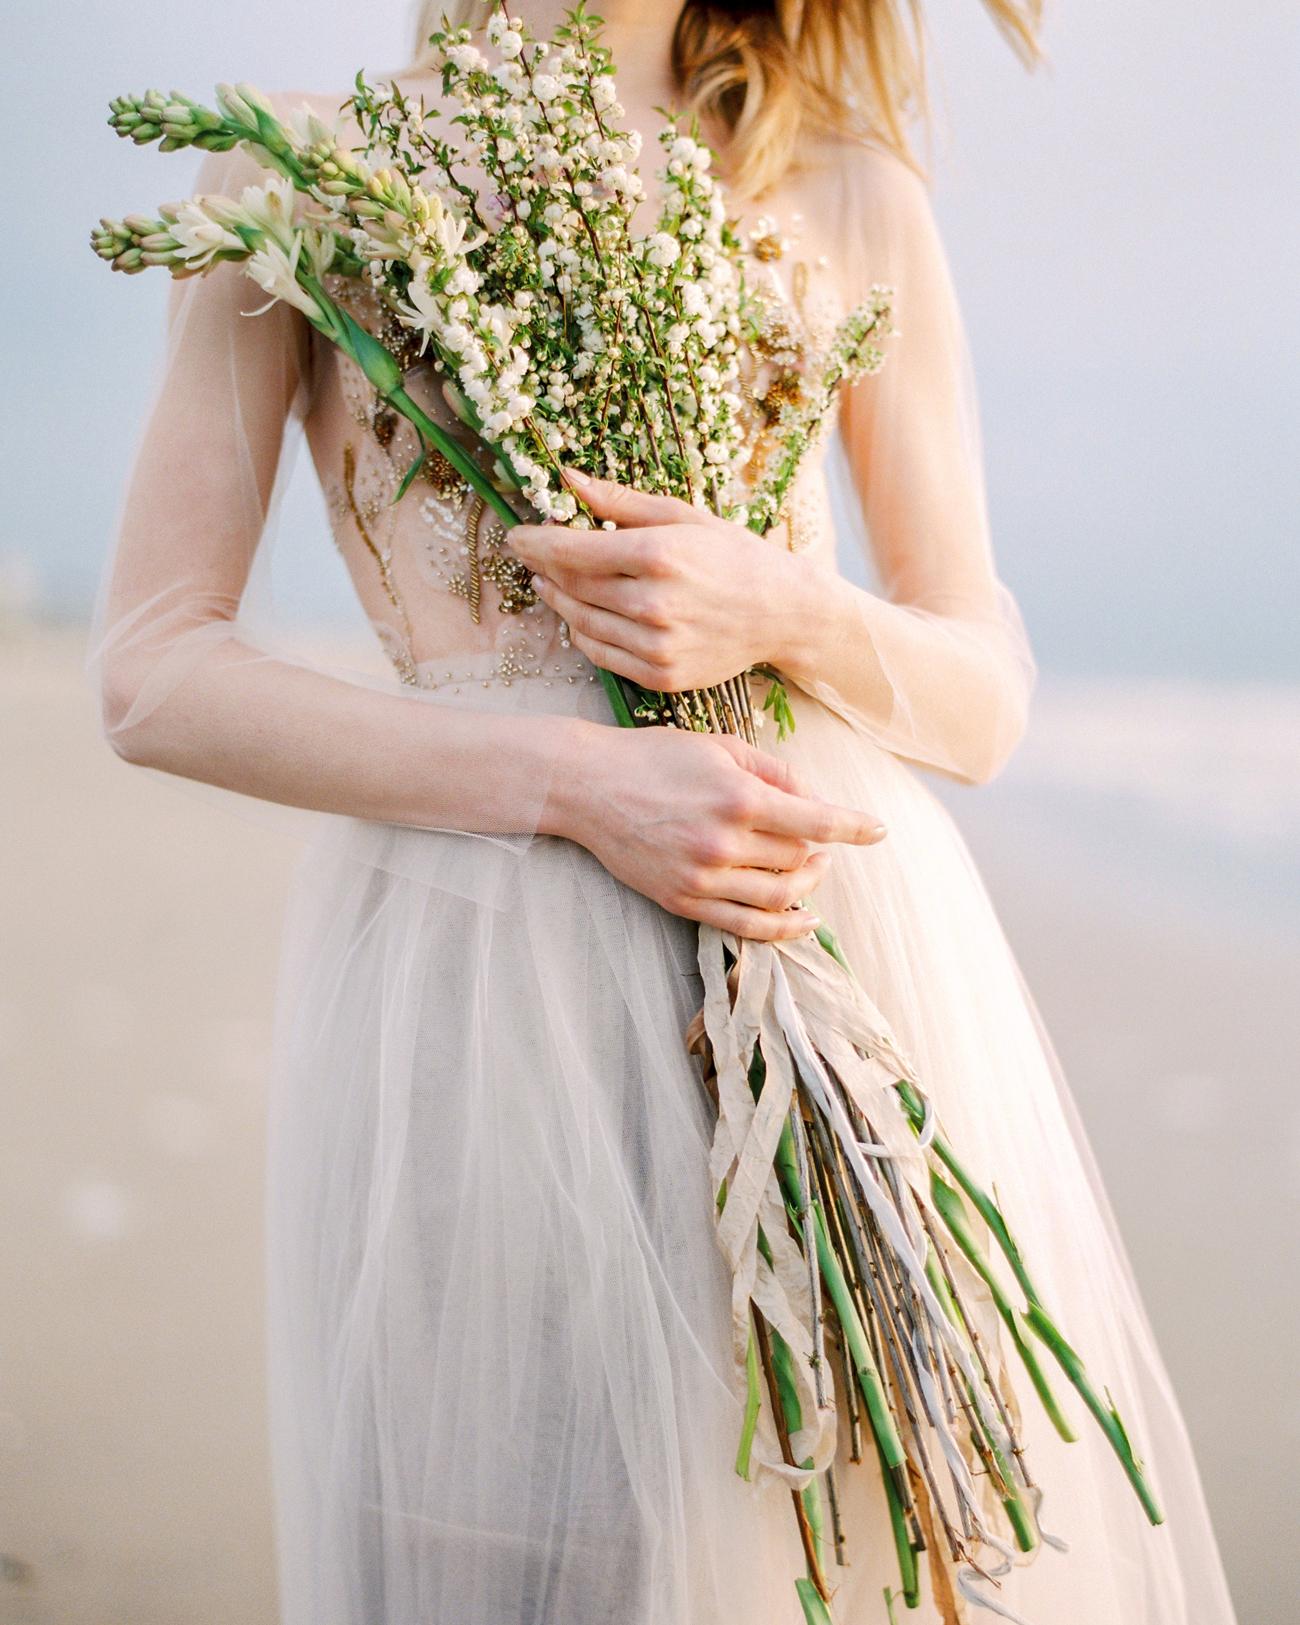 extremely long stemmed wedding bouquet arrangement